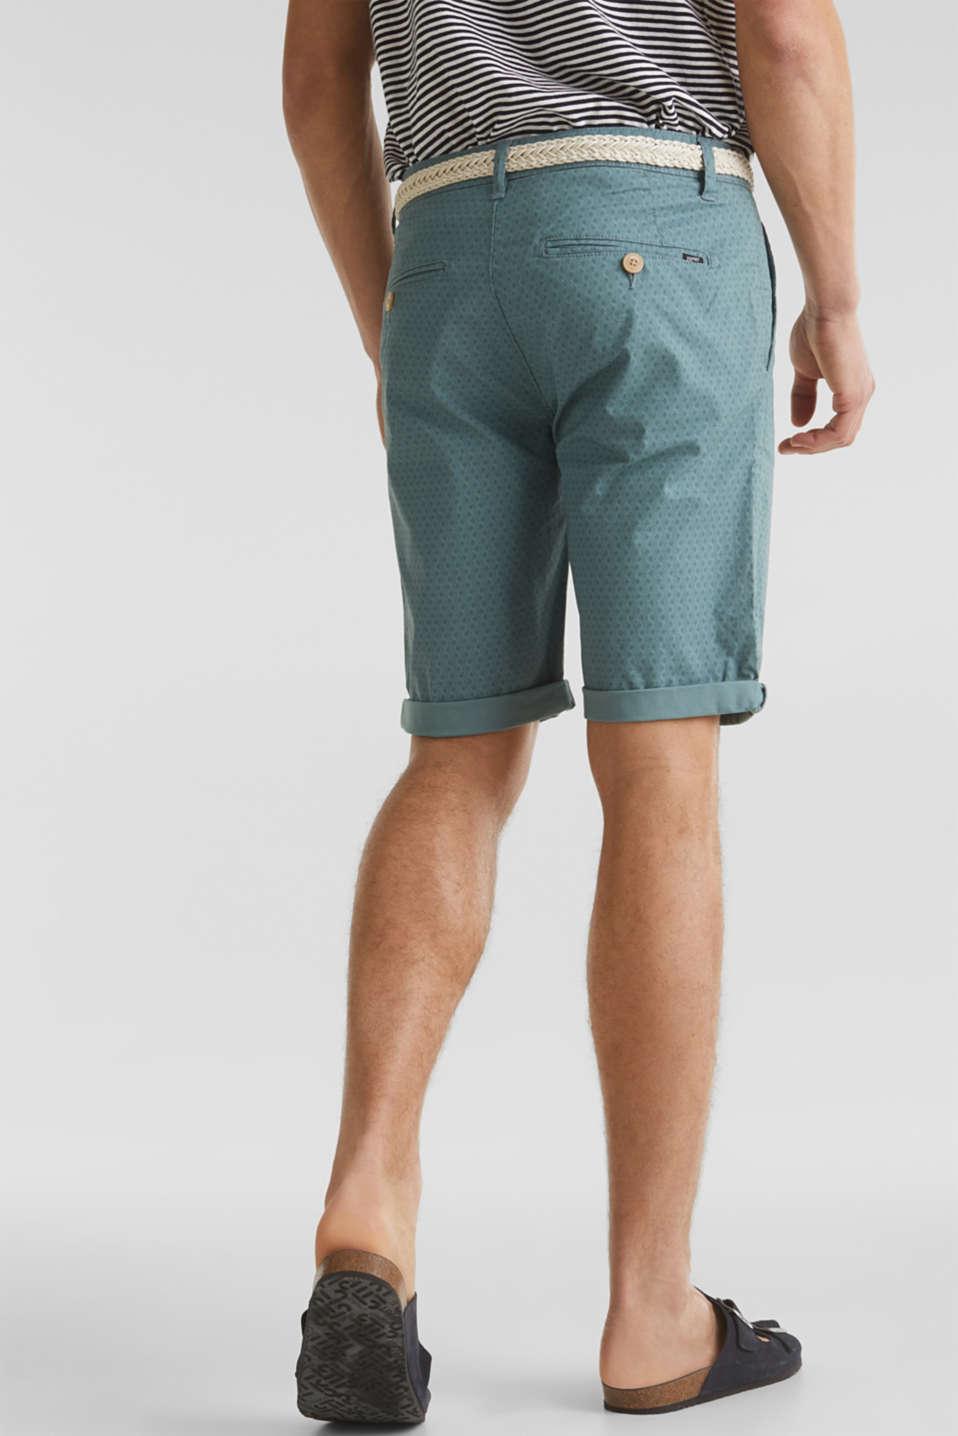 Organic cotton Shorts + belt, TEAL GREEN, detail image number 3